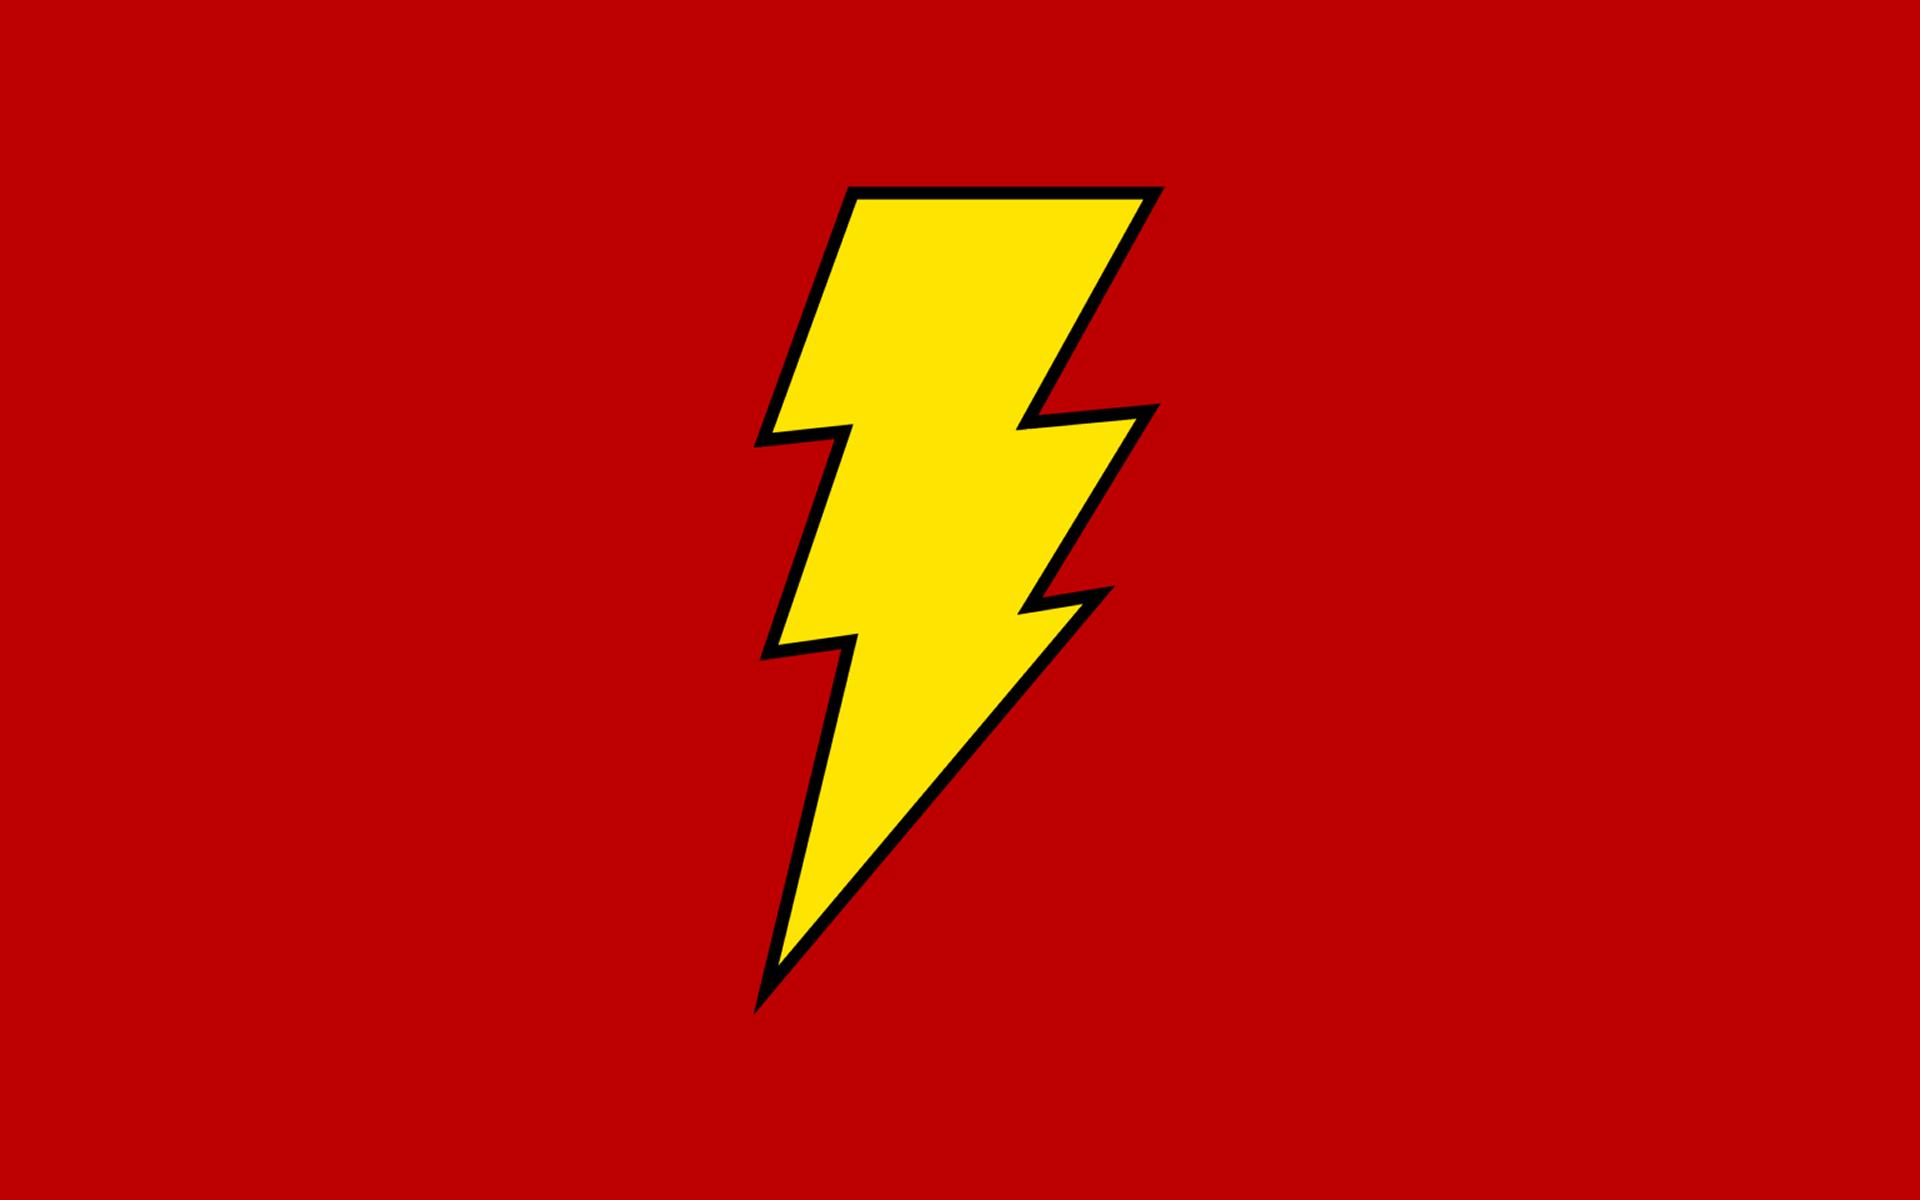 Shazam Hd Wallpaper Background Image 1920x1200 Id 615417